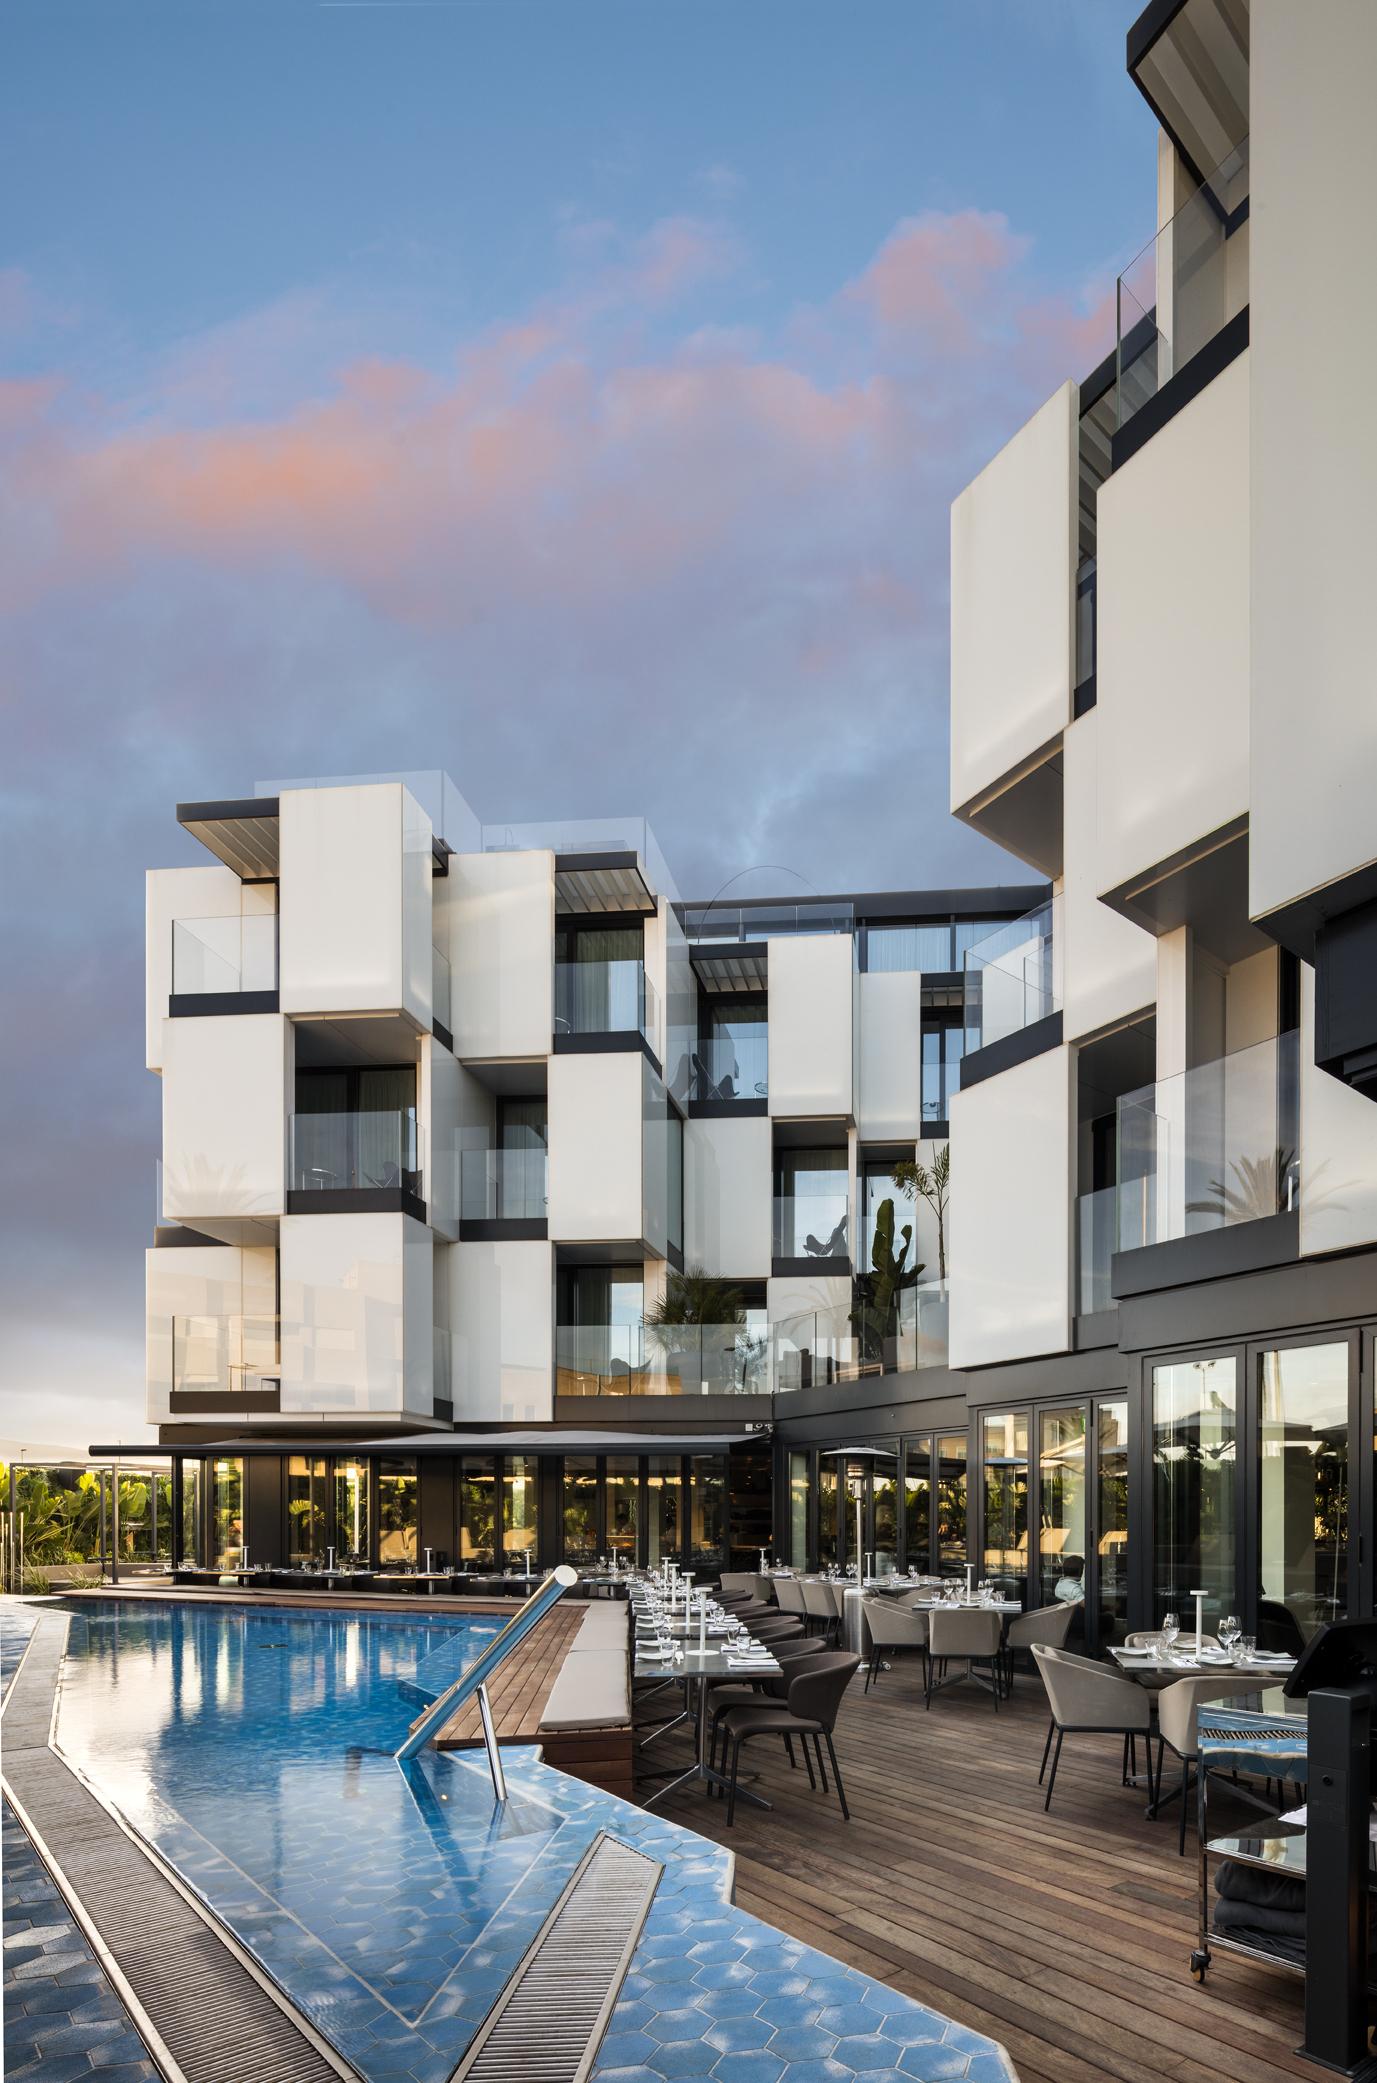 7 Star Hotel Rooms: Gallery Of Hotel Sir Joan Ibiza / Ribas&Ribas Architects